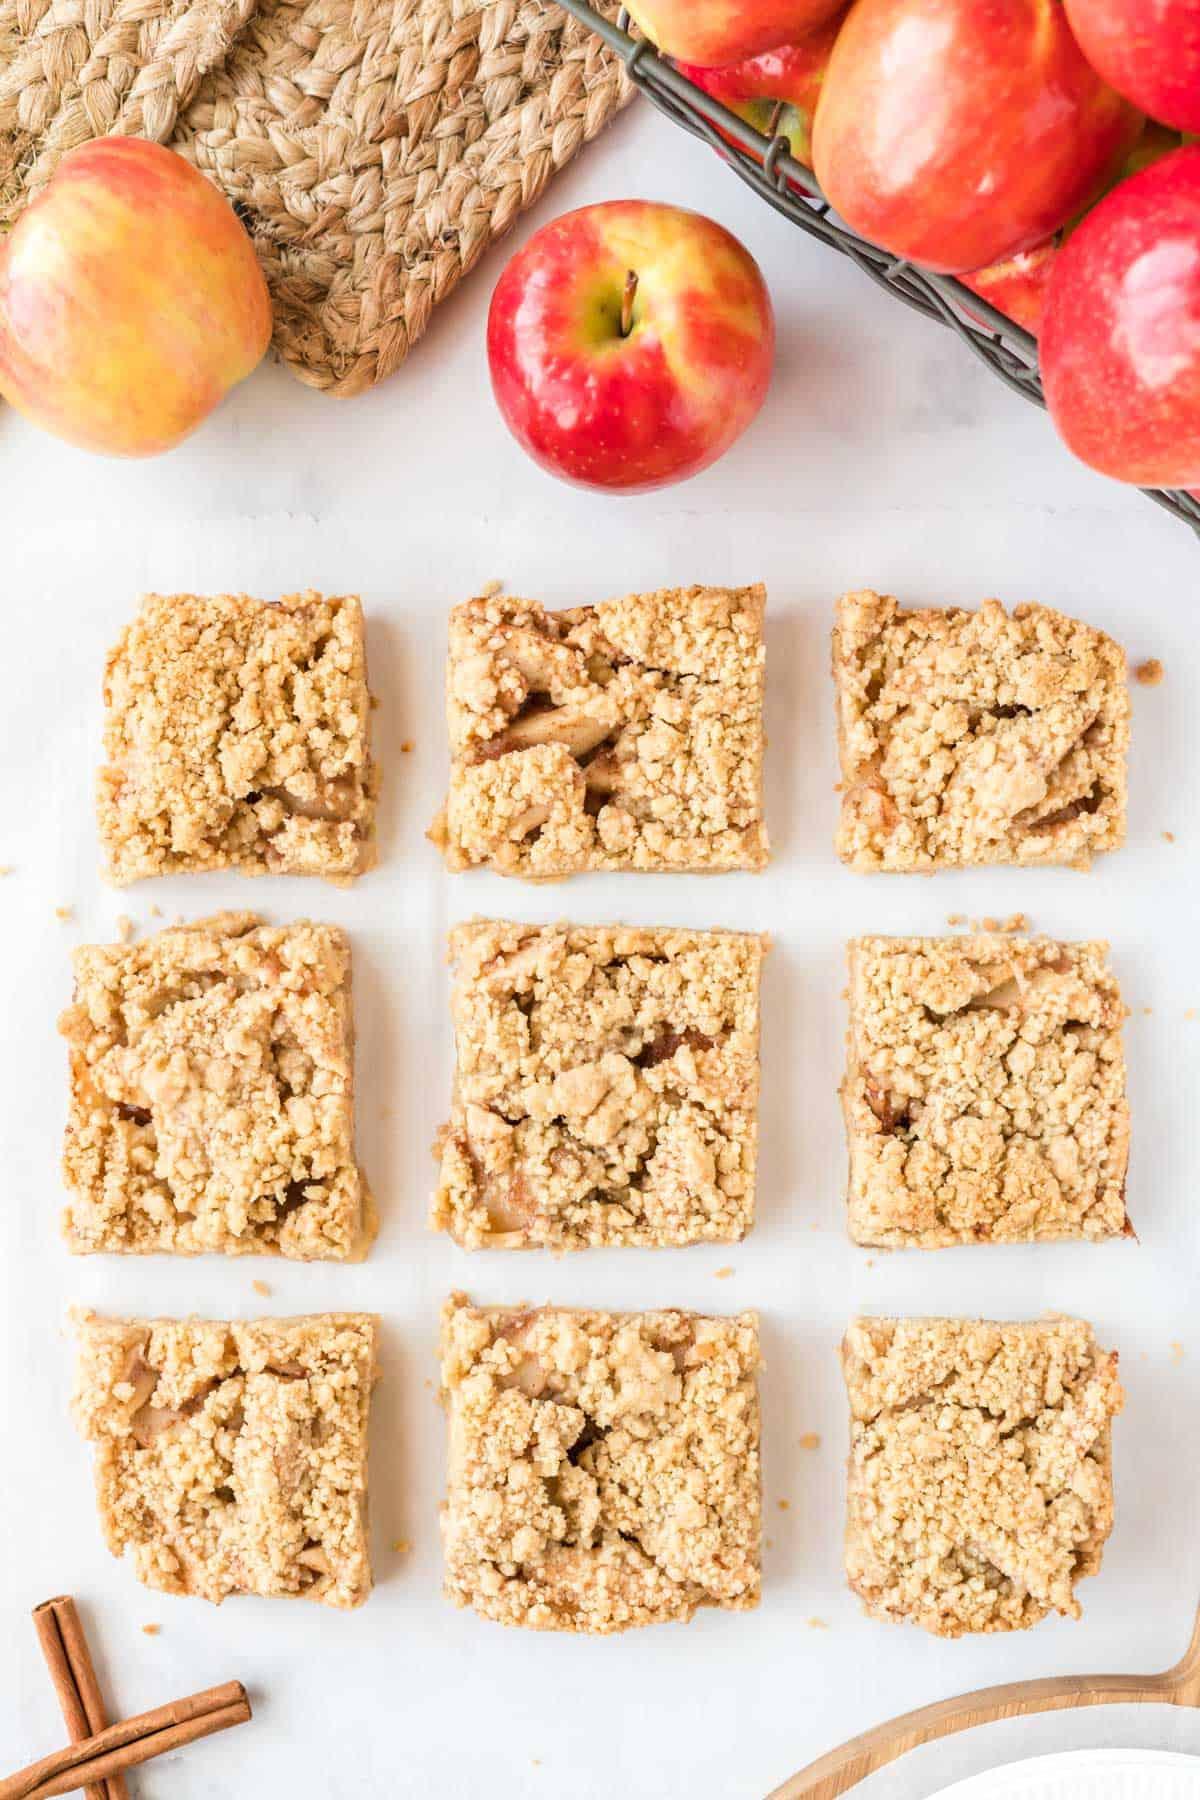 apple crisp bars cut into 9 pieces